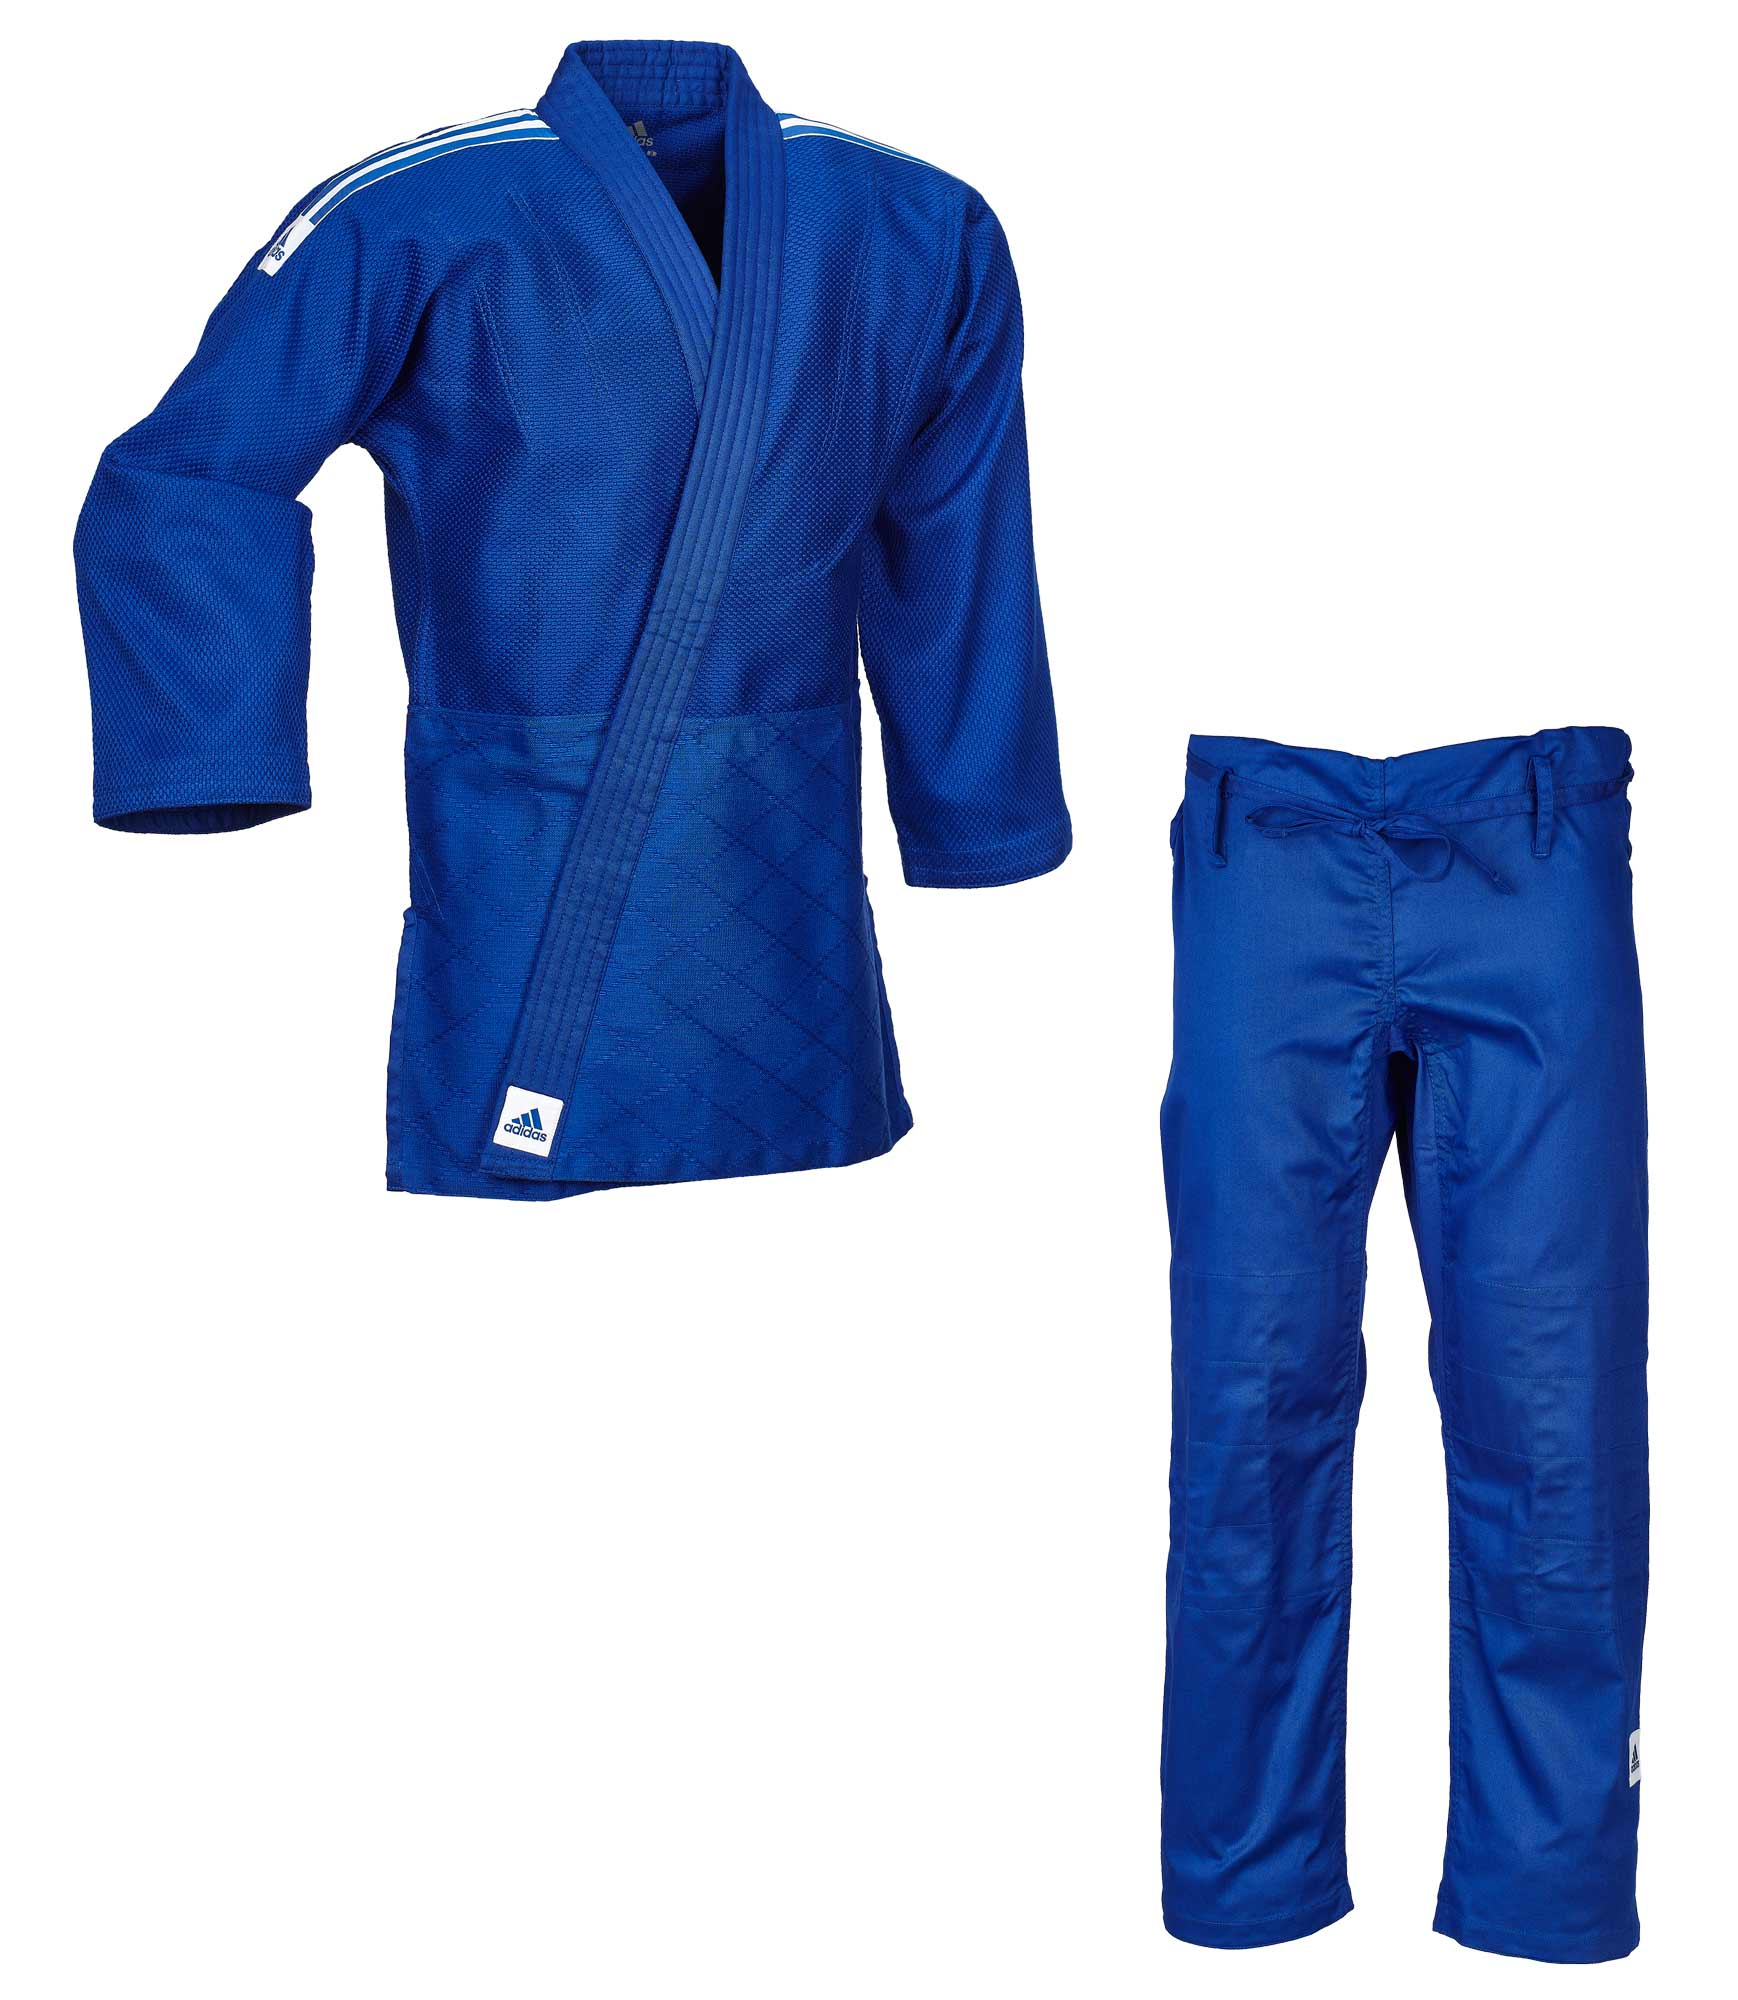 patio de recreo corto El diseño  adidas judo gi Training J500 blue/white stripes | adidas | Brands |  Ju-Sports